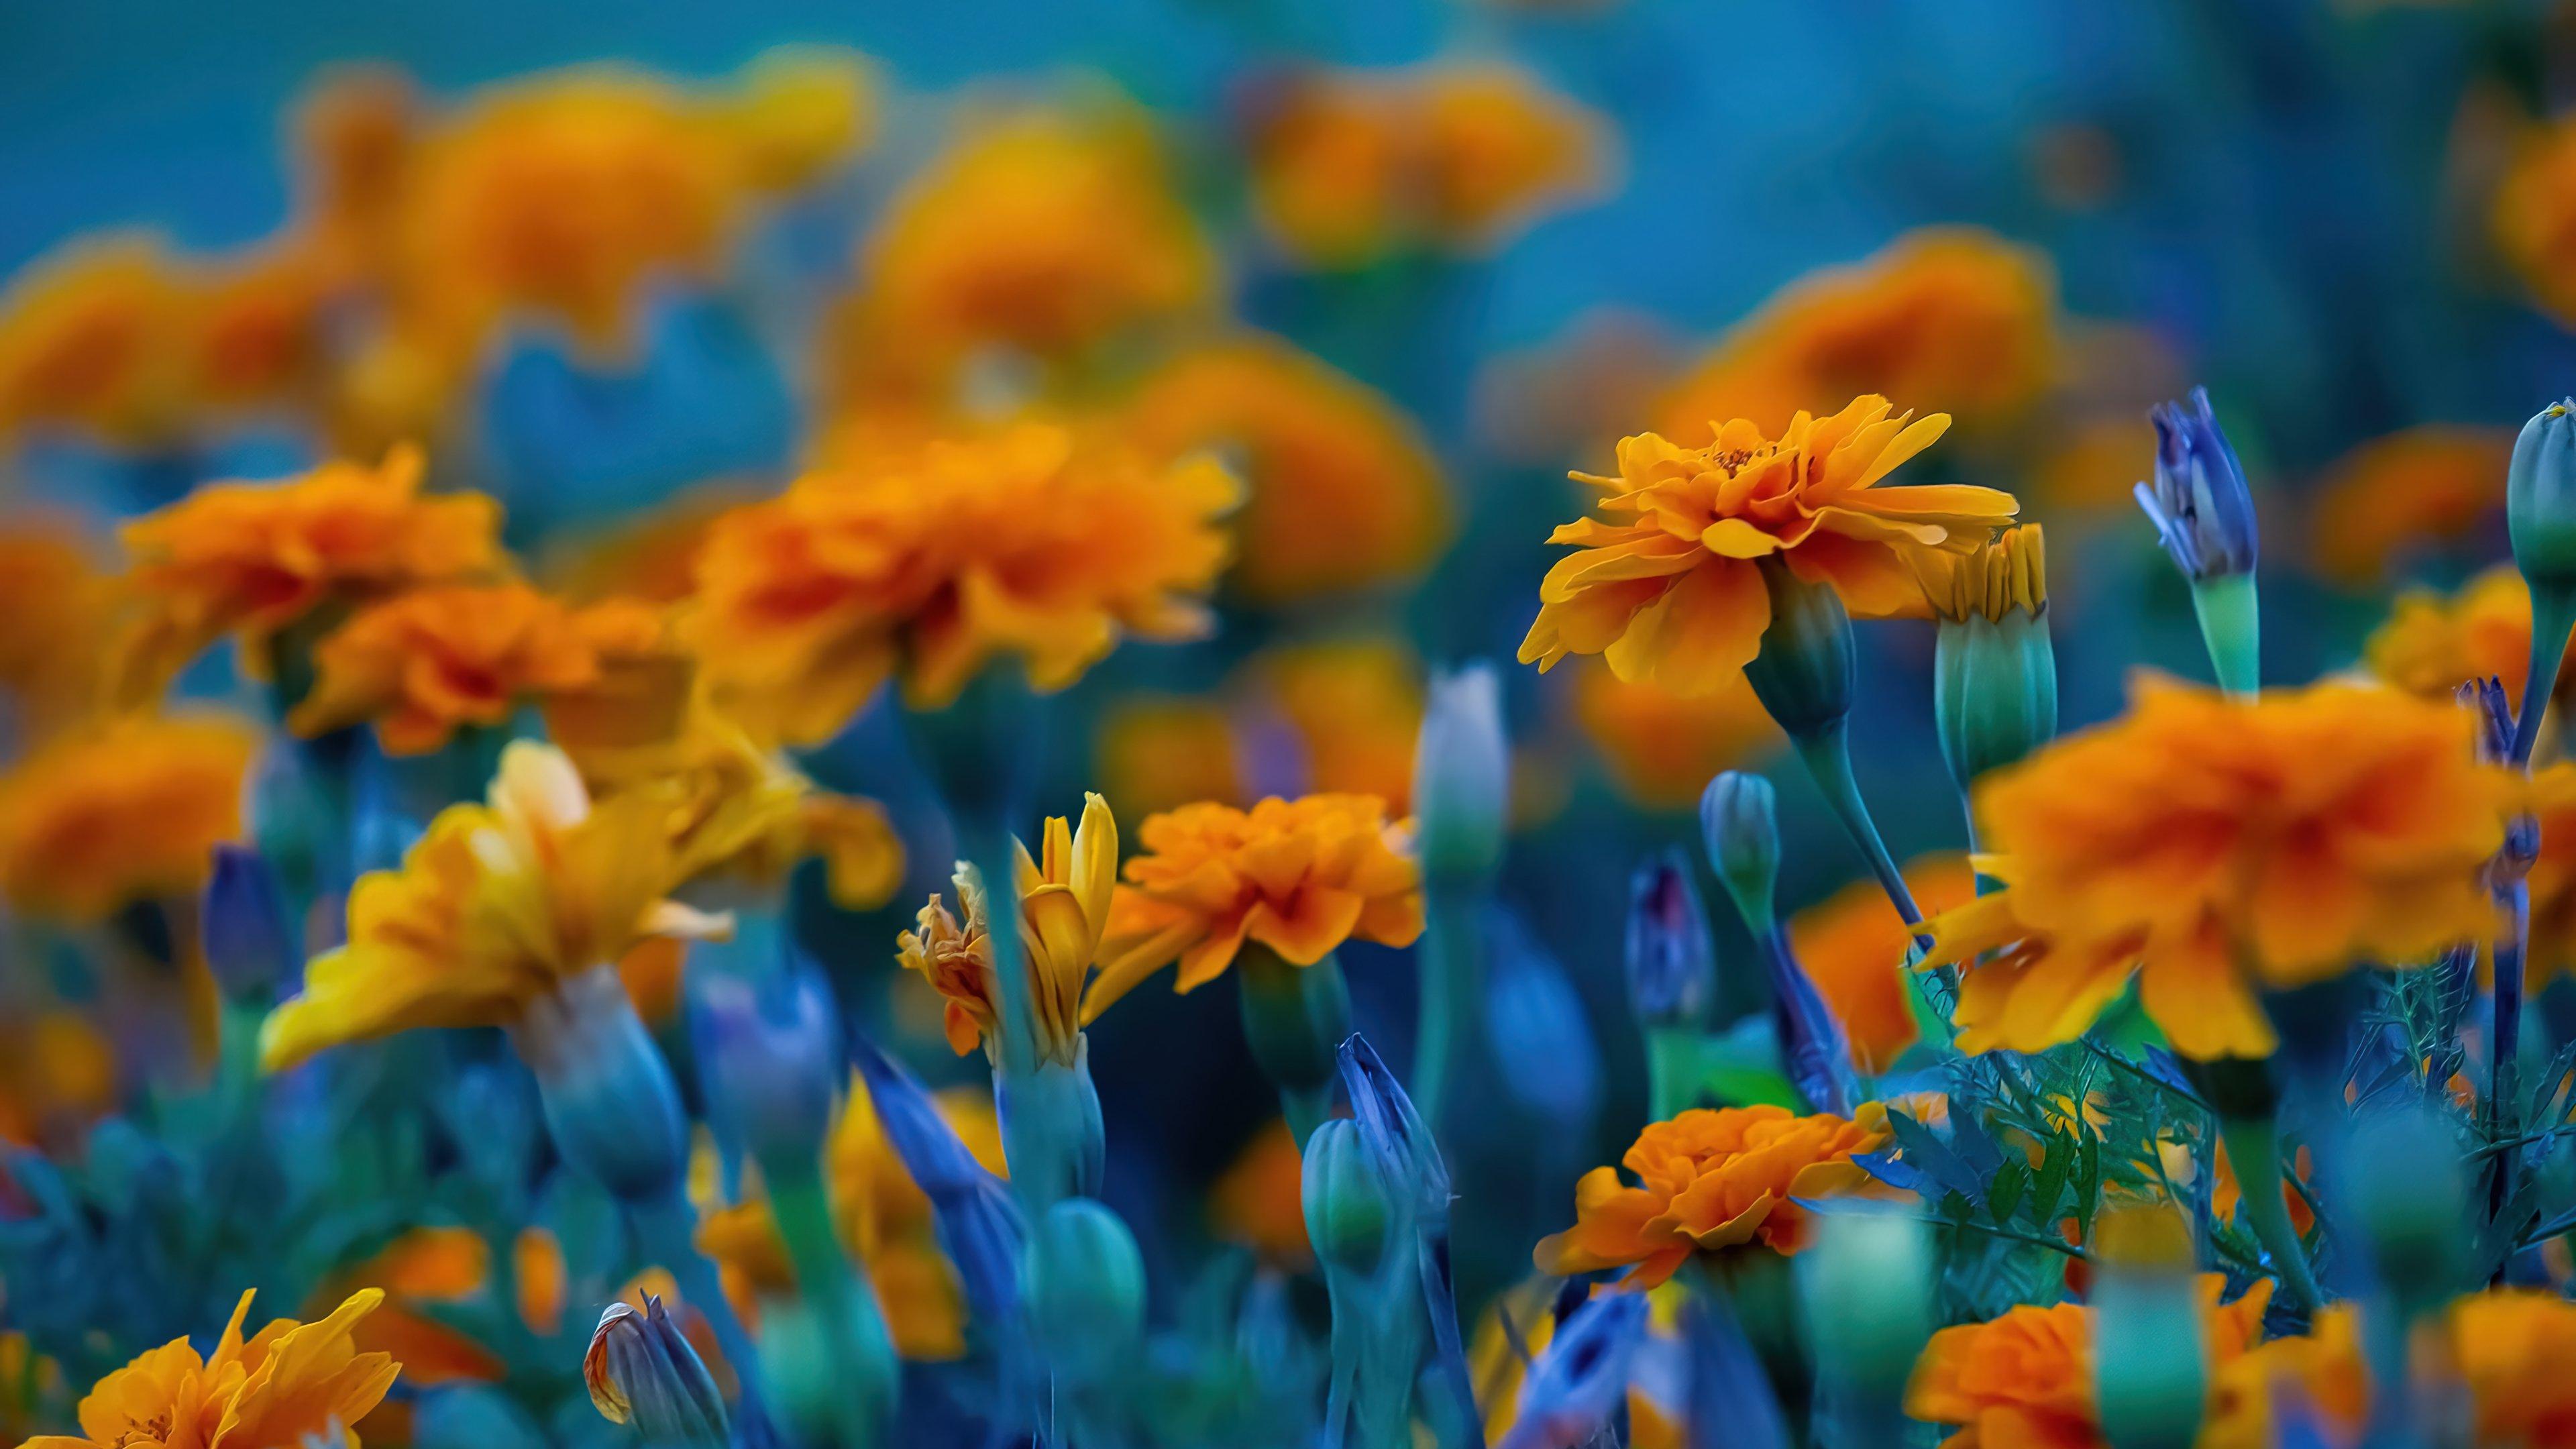 Fondos de pantalla Campo de flores amarillas